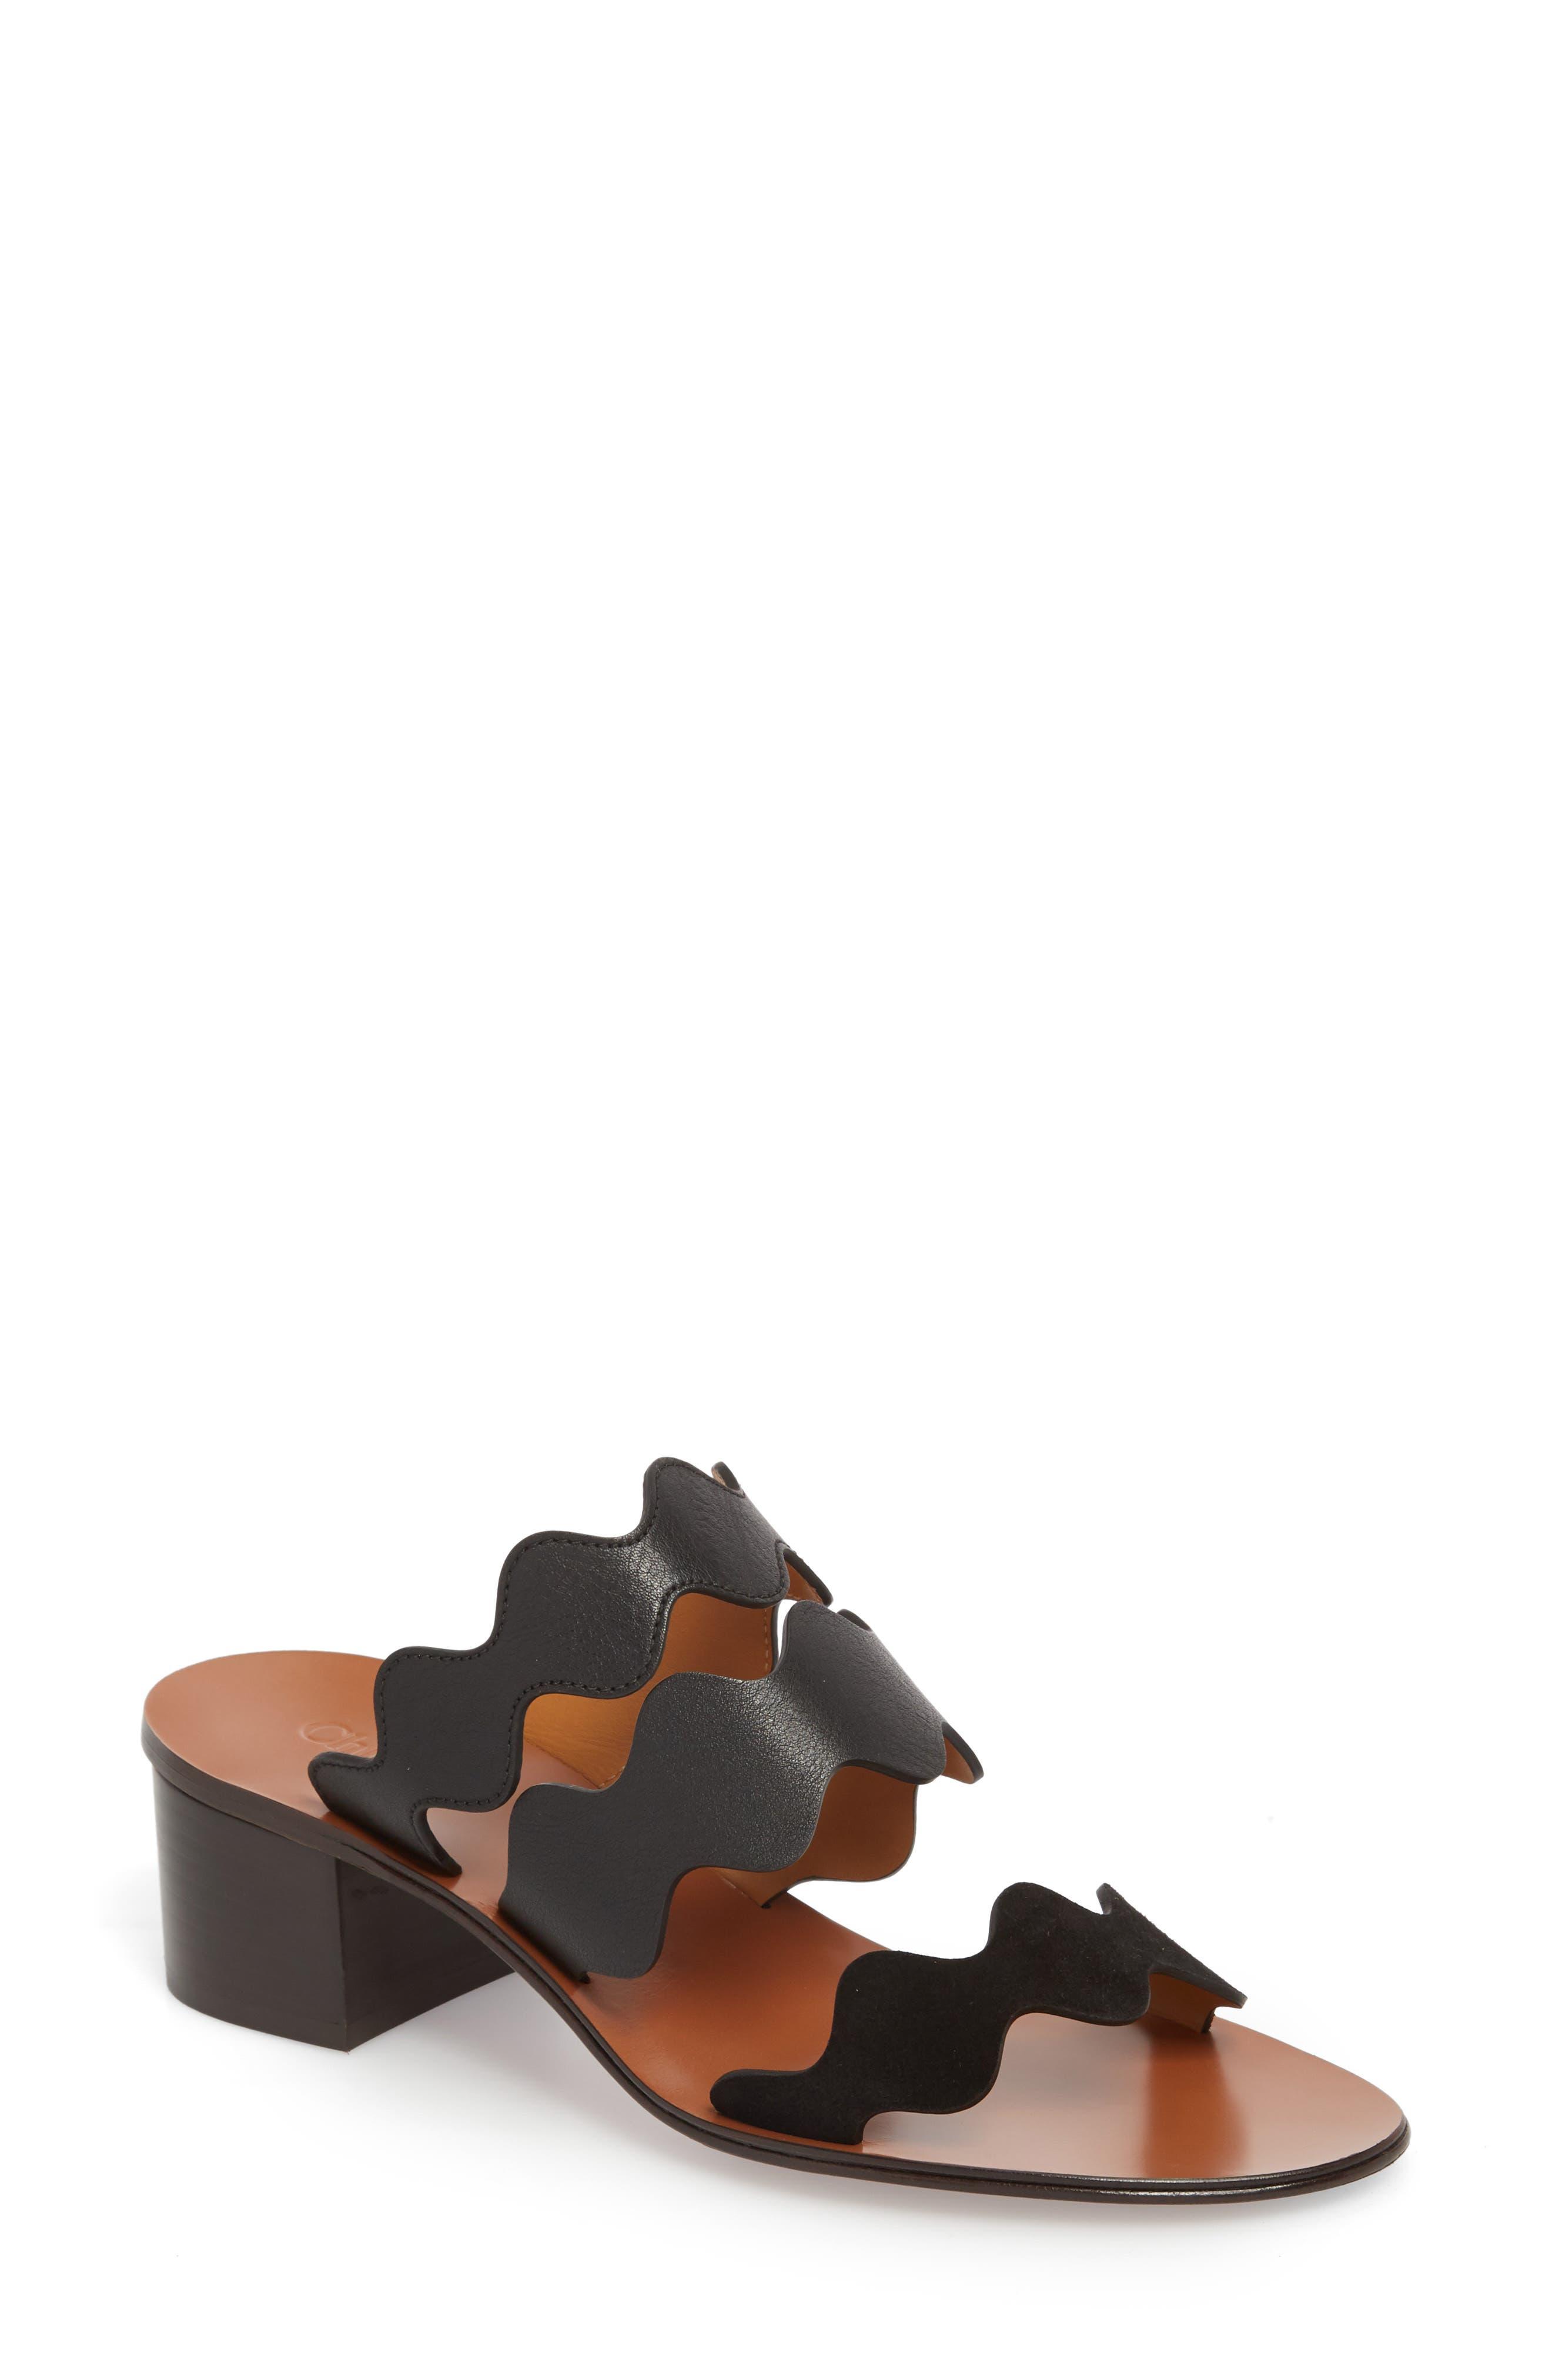 Lauren Slide Sandal,                             Main thumbnail 1, color,                             Black